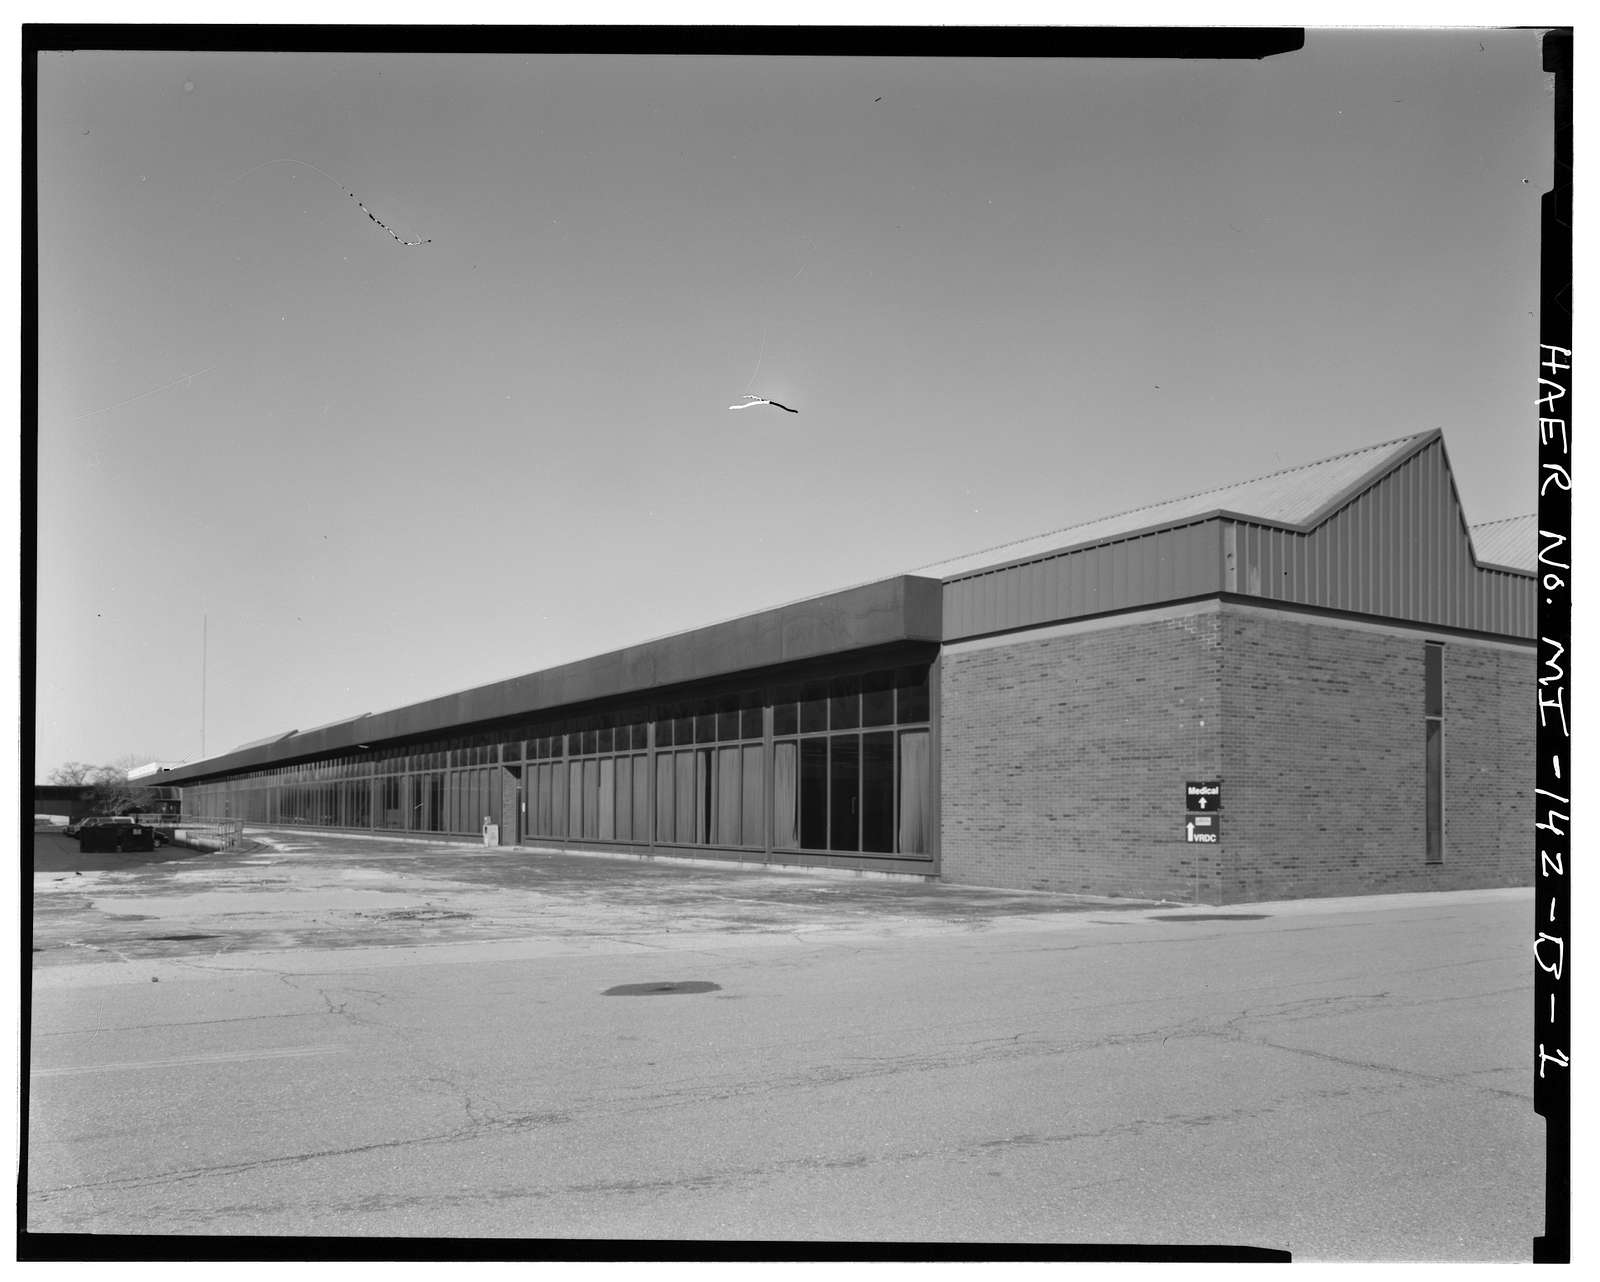 Chrysler Center, Plant No. 4, Highland Park, Wayne County, MI